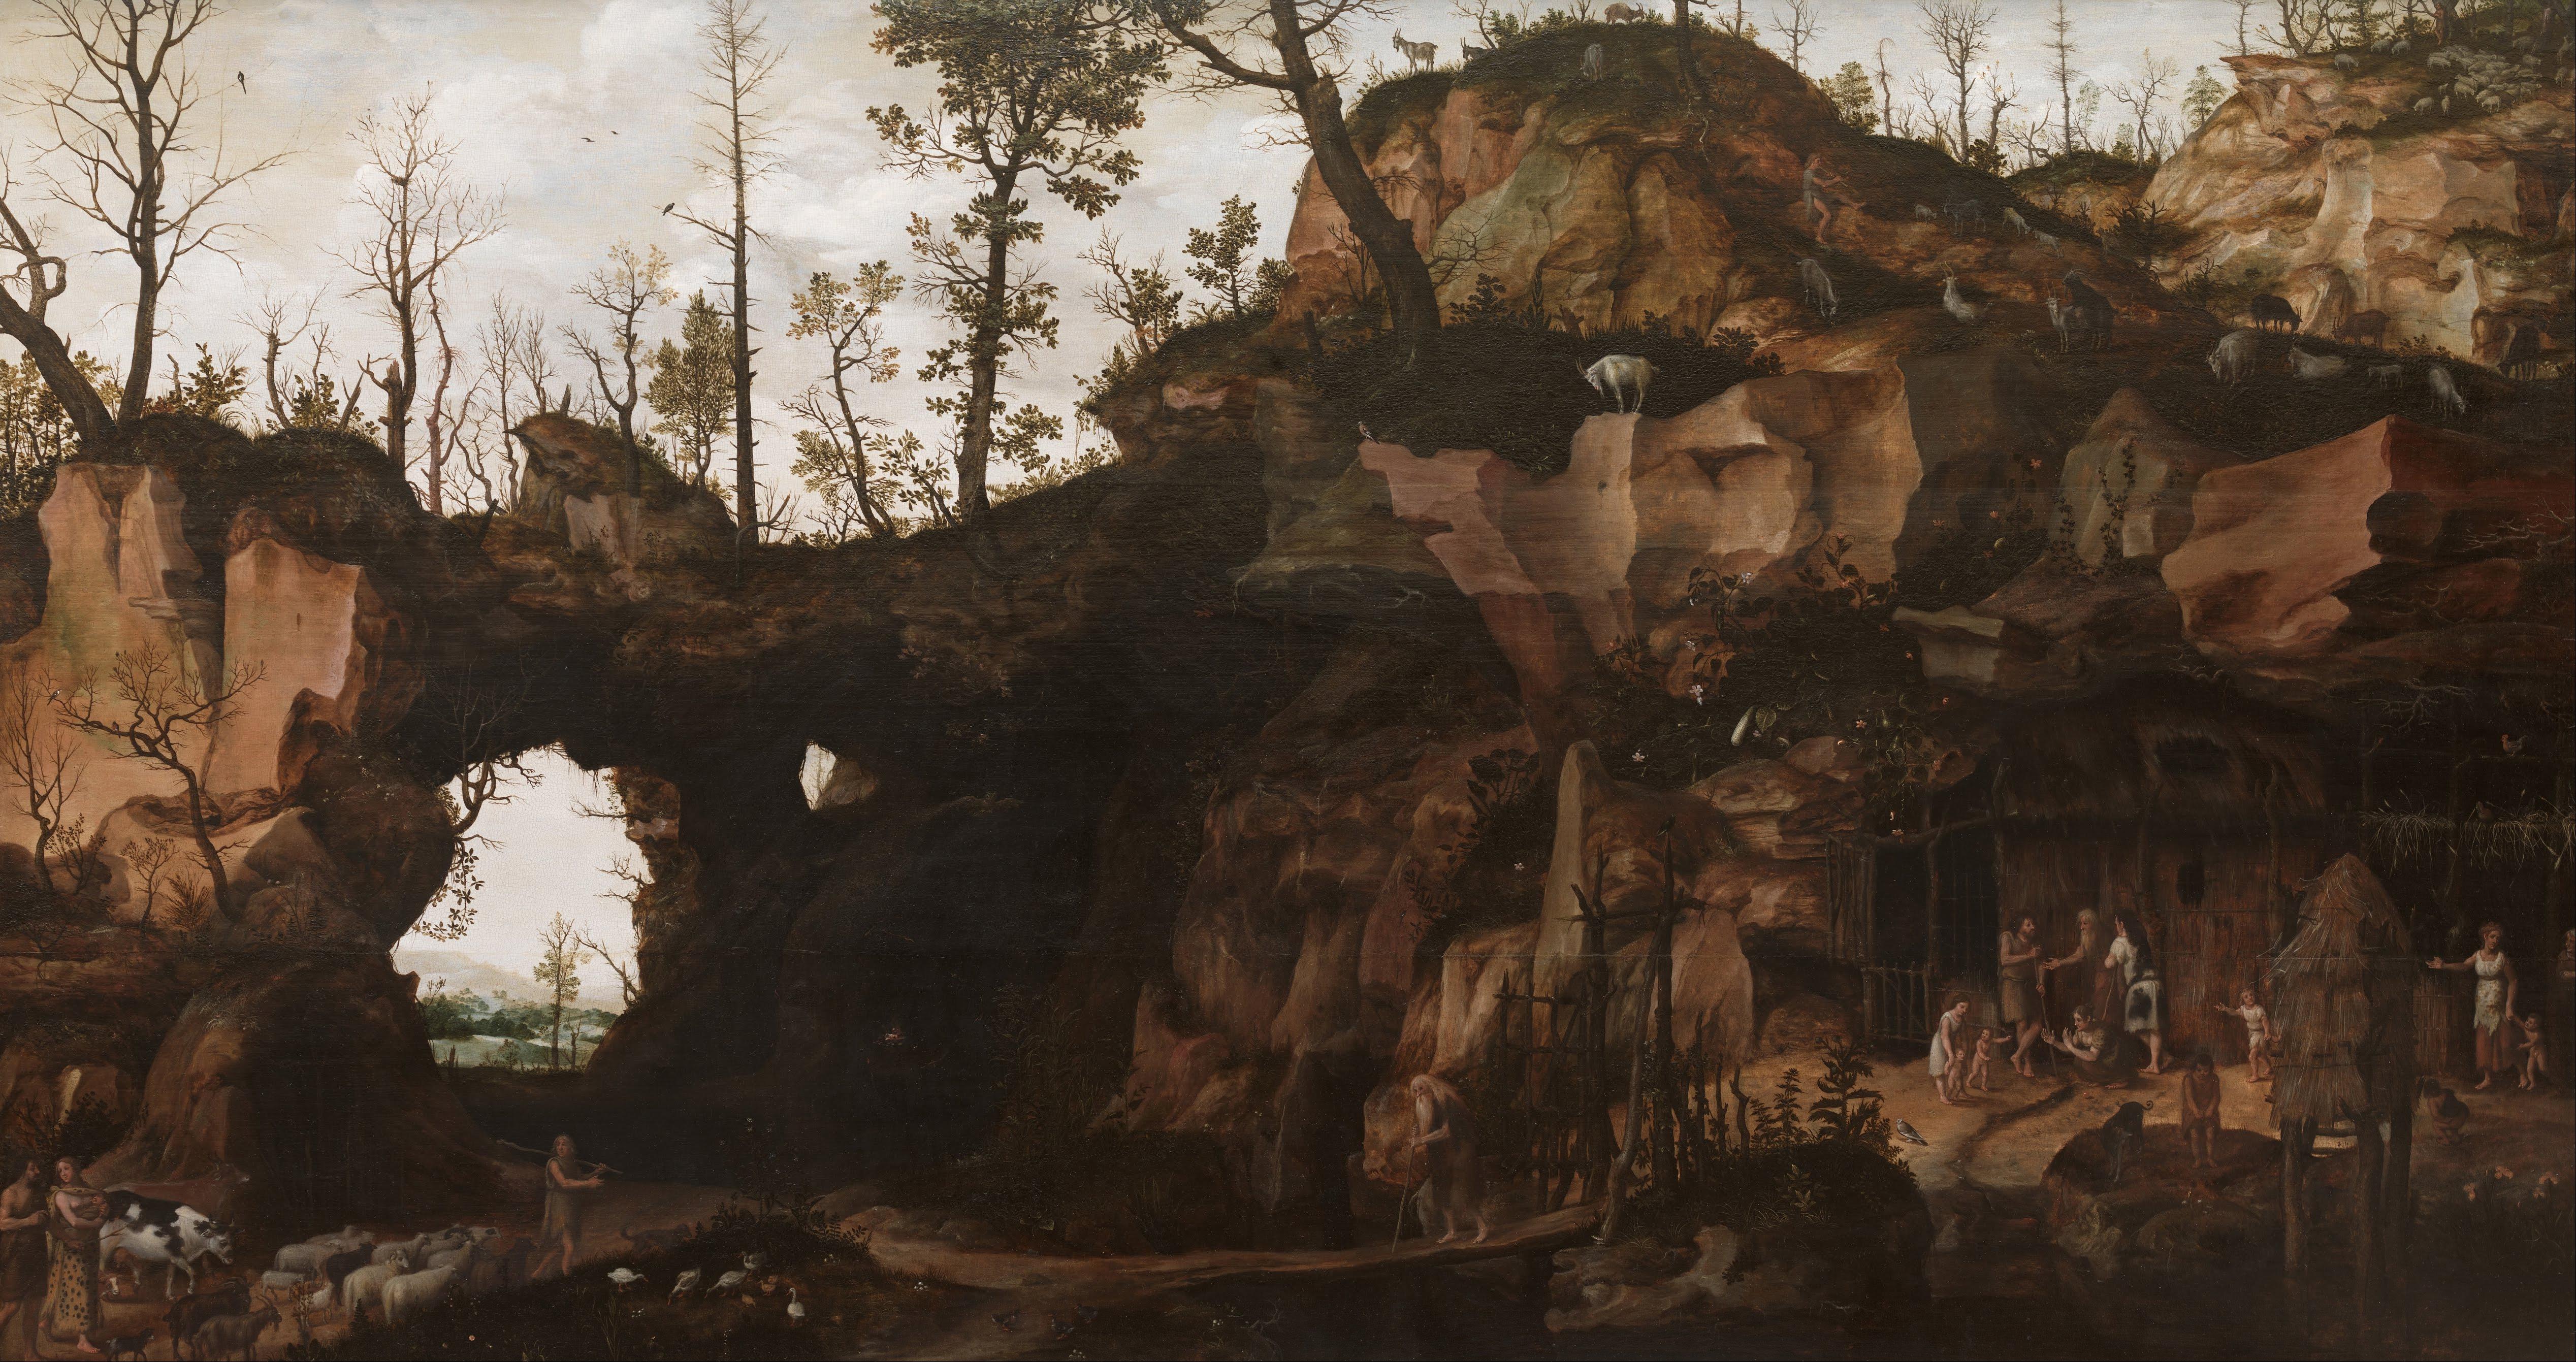 Cornelis_van_Dalem_-_The_Dawn_of_Civiliz